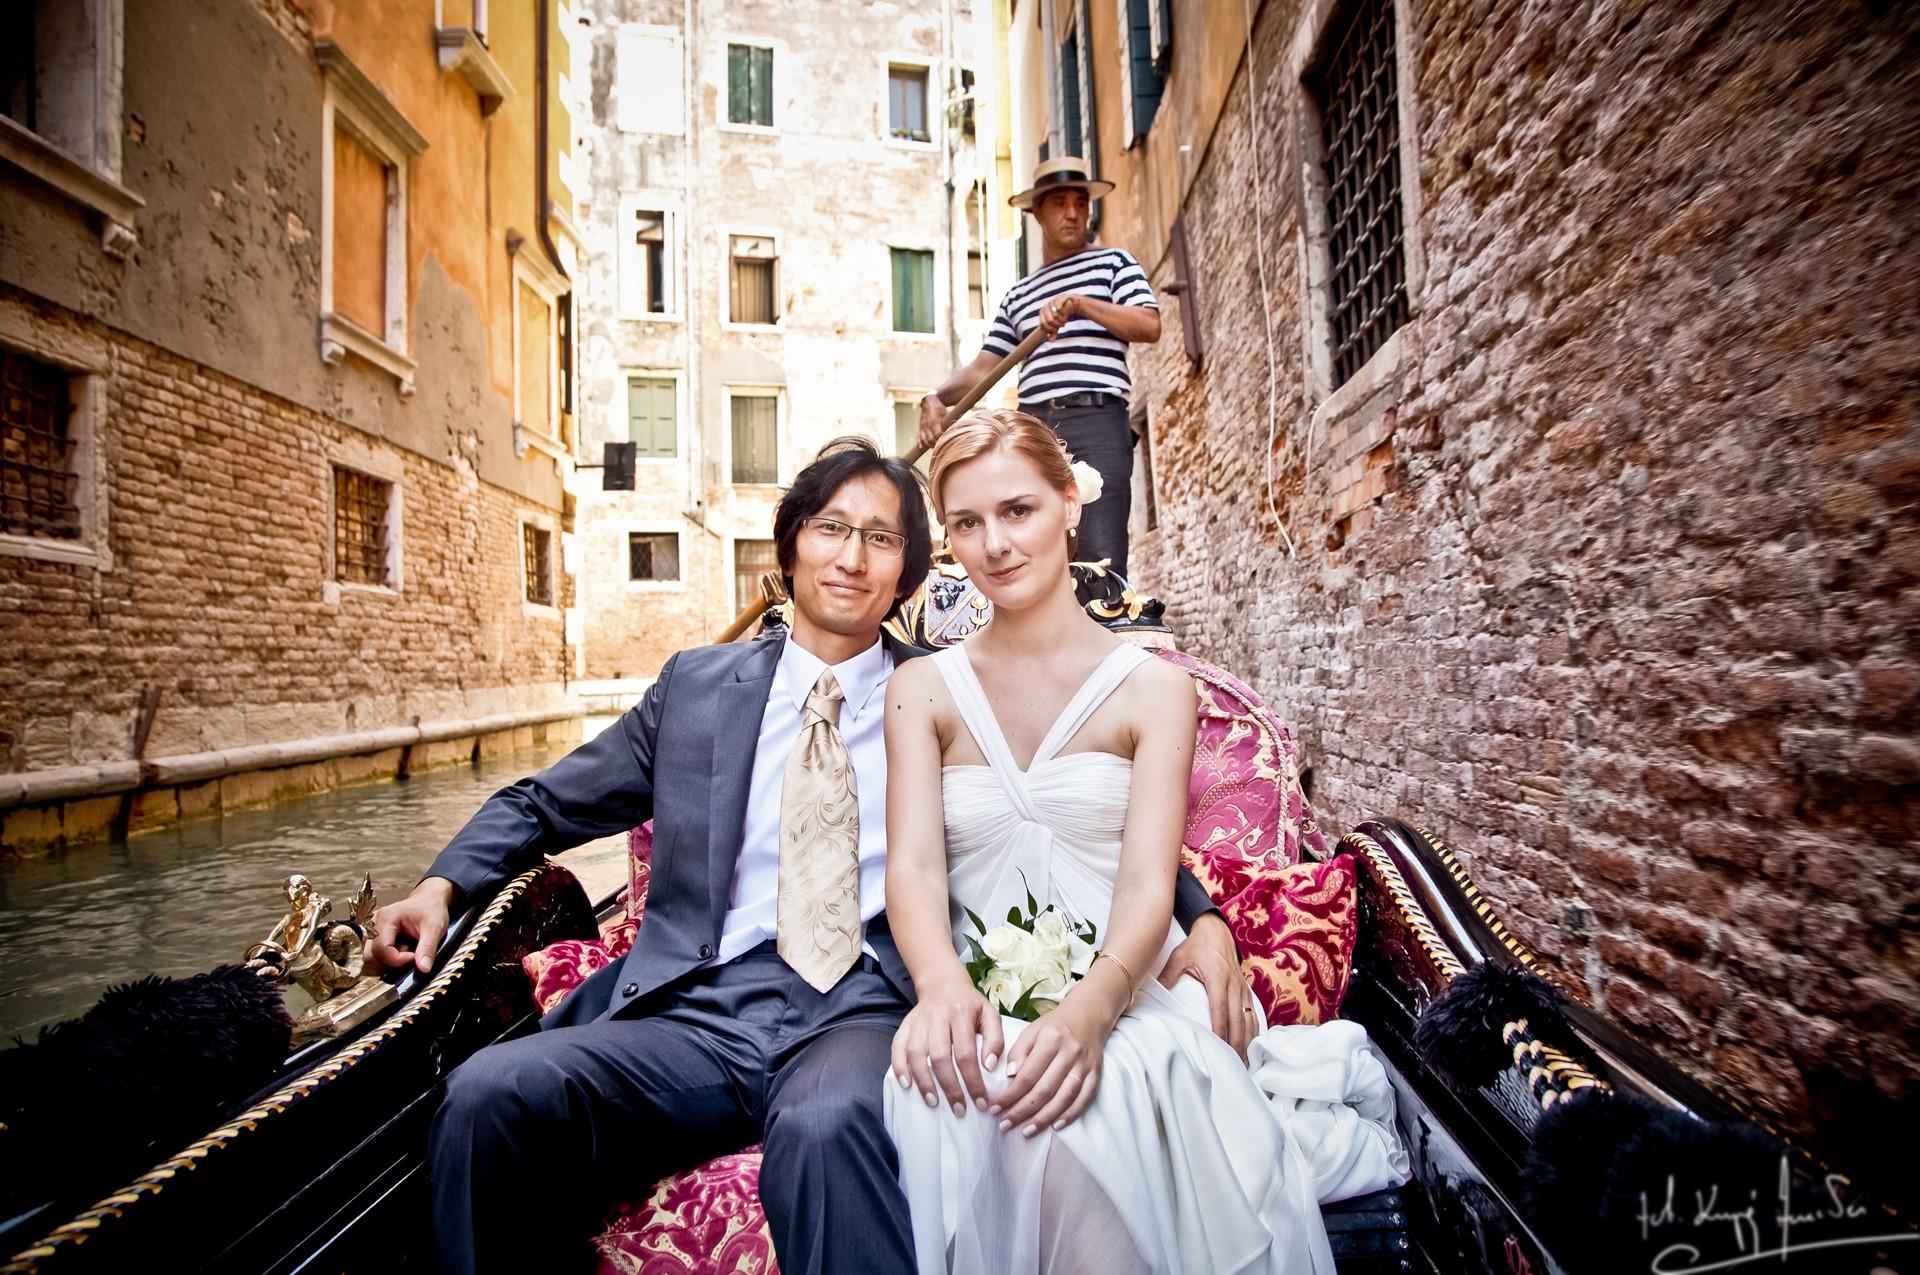 Ślub w wenecji 45 Manuela Luiza & Young Seon Song